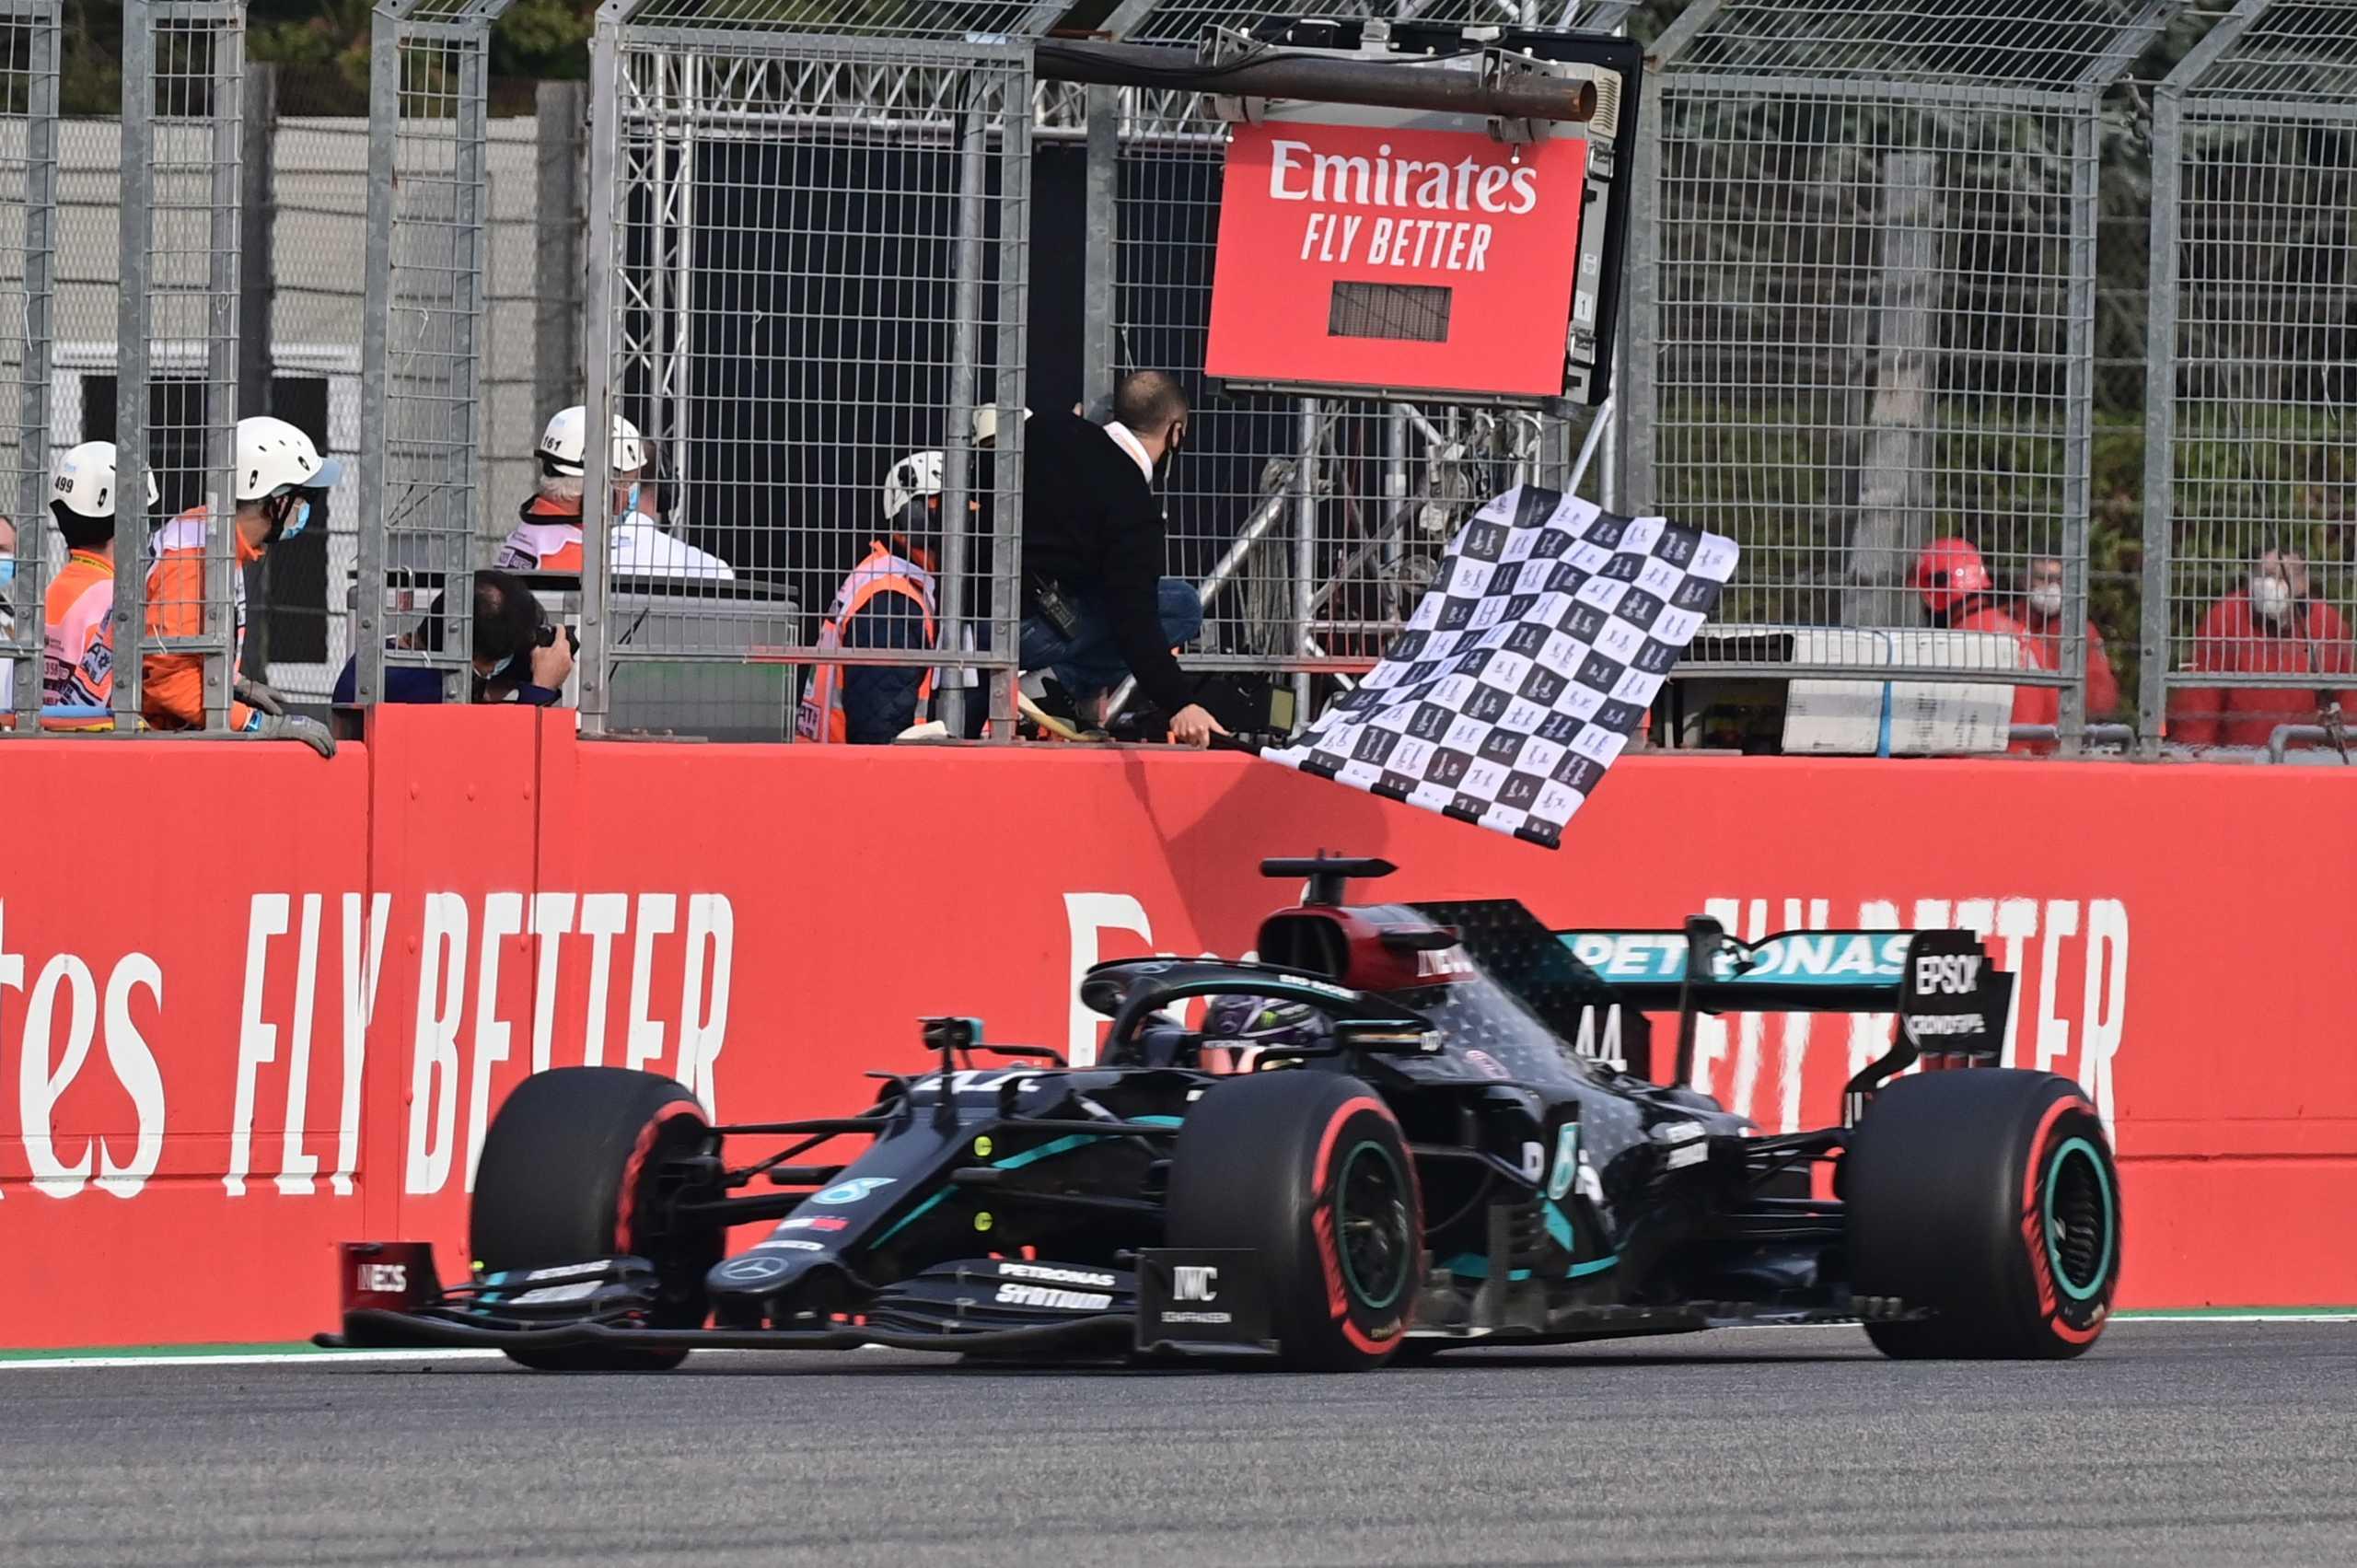 Formula 1: Πιθανή η αναβολή του γκραν πρι Αυστραλίας λόγω κορονοϊού